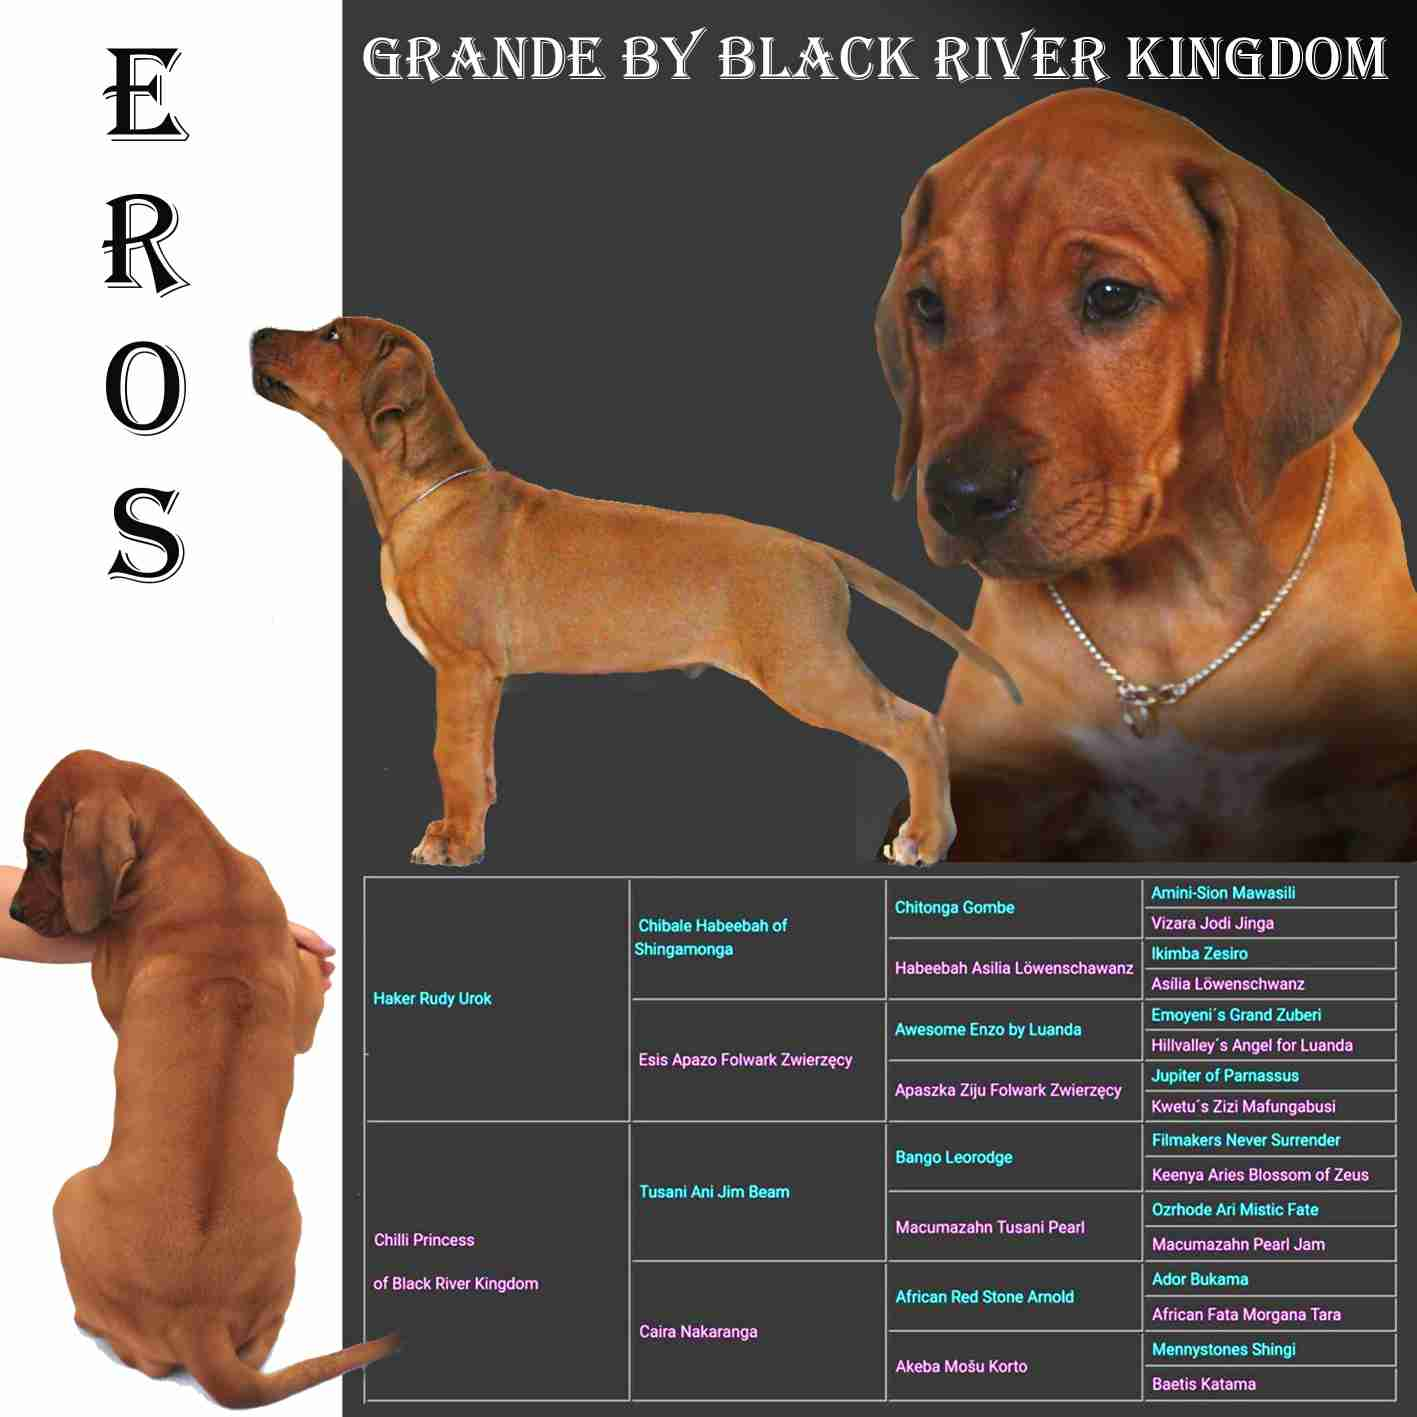 EROS GRANDE by Black River Kingdom